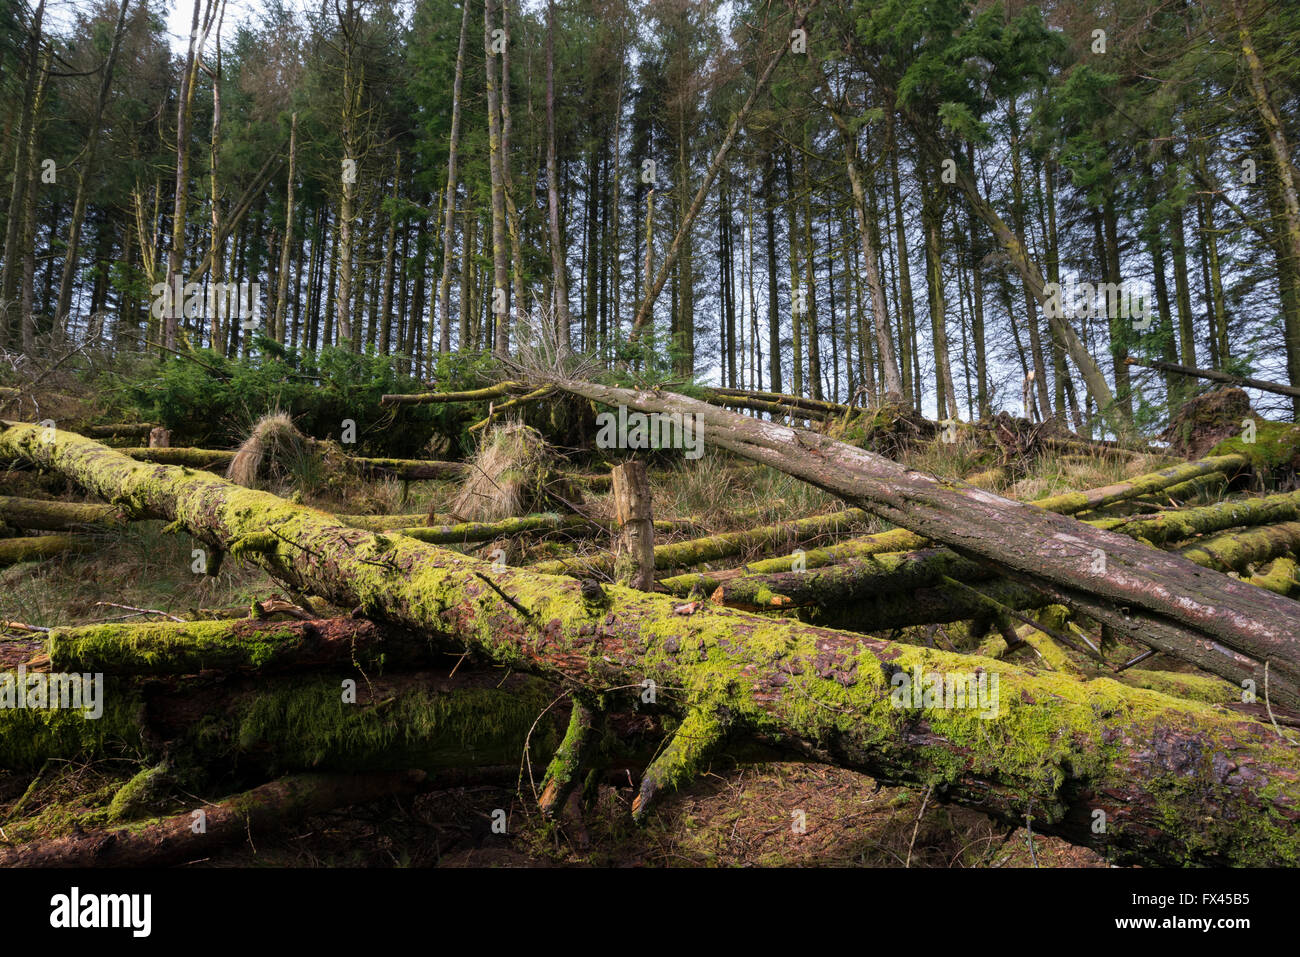 Blean Llia, woodland control, Breacon Beacons National Park, Wales, UK - Stock Image